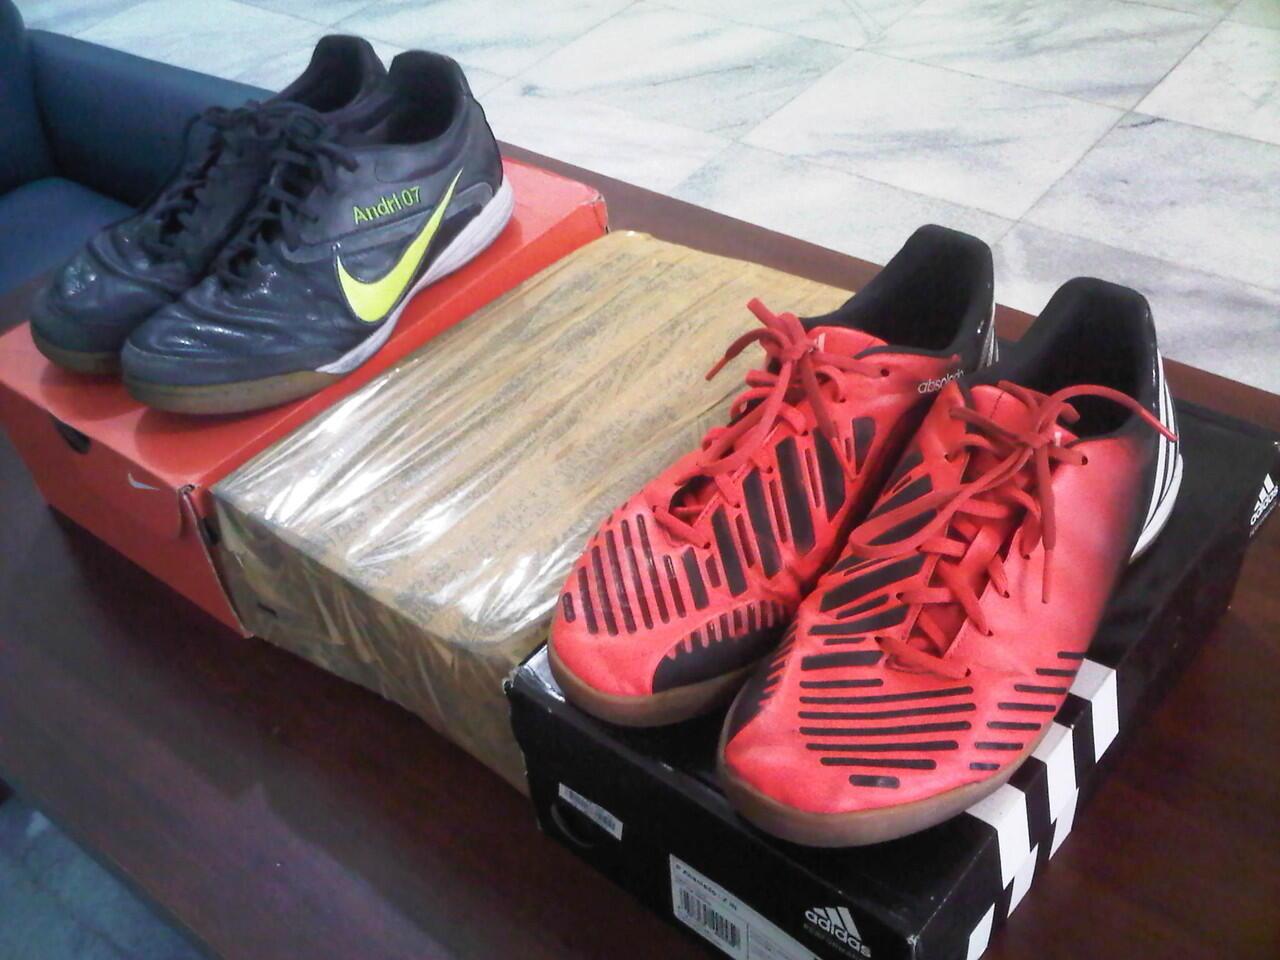 WTS 2nd Adidas Predator Absolado LZ, CTR360, GATO LTR size 42 ORIGINAL 100% [BOX]